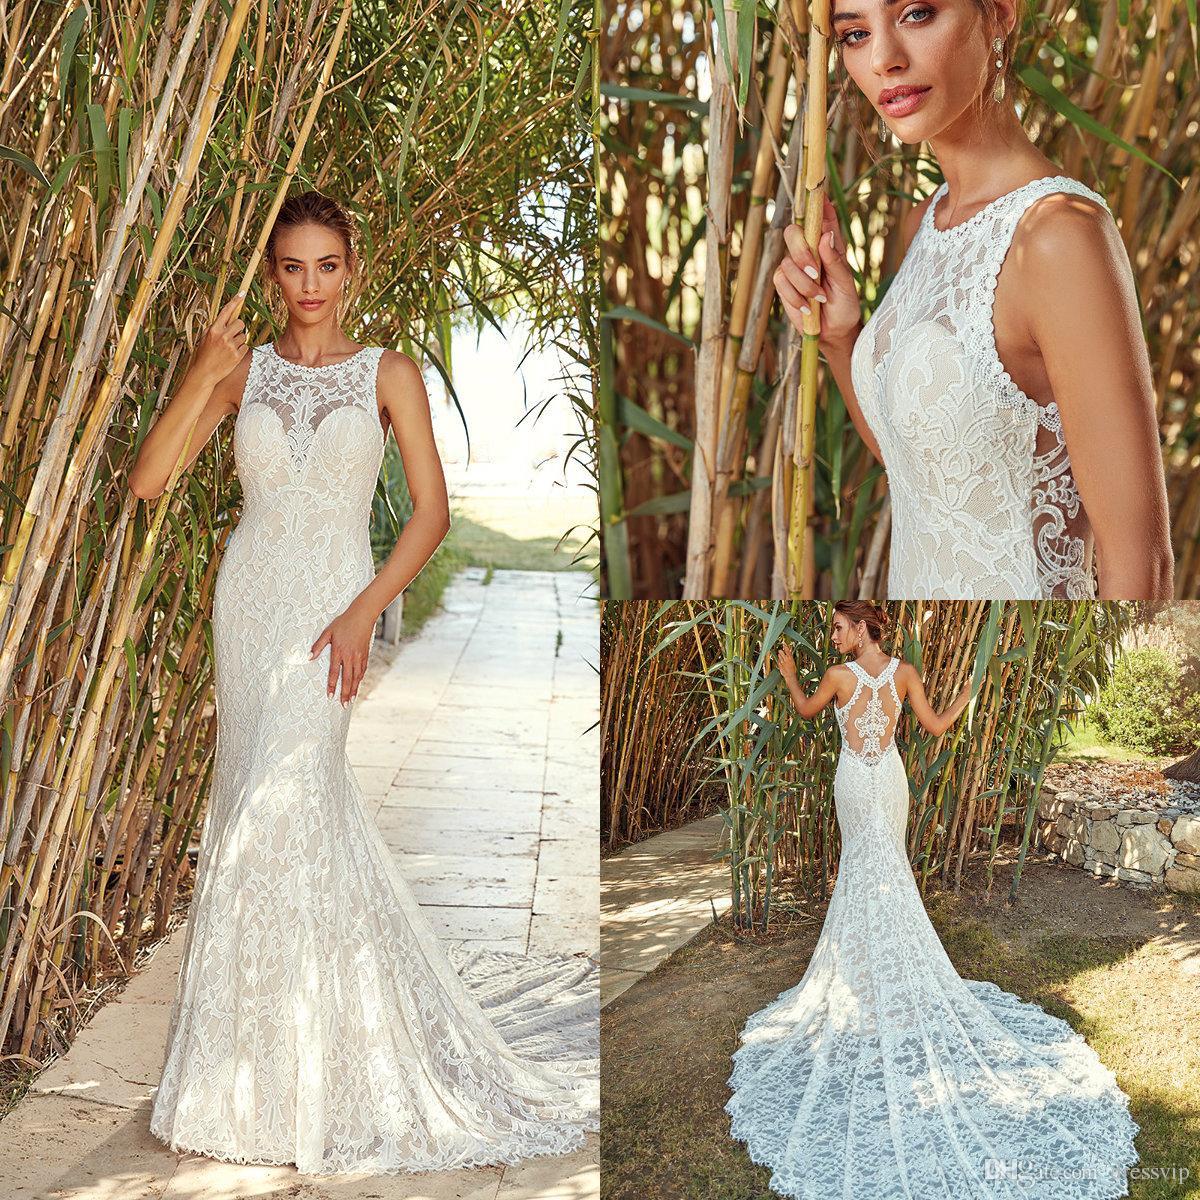 eff179d6677a Eddy K Mermaid Wedding Dresses Lace Jewel Neck Sweep Train Sleeveless Beach Wedding  Dress Button Back Plus Size Country Bridal Gowns Halter Mermaid Wedding ...